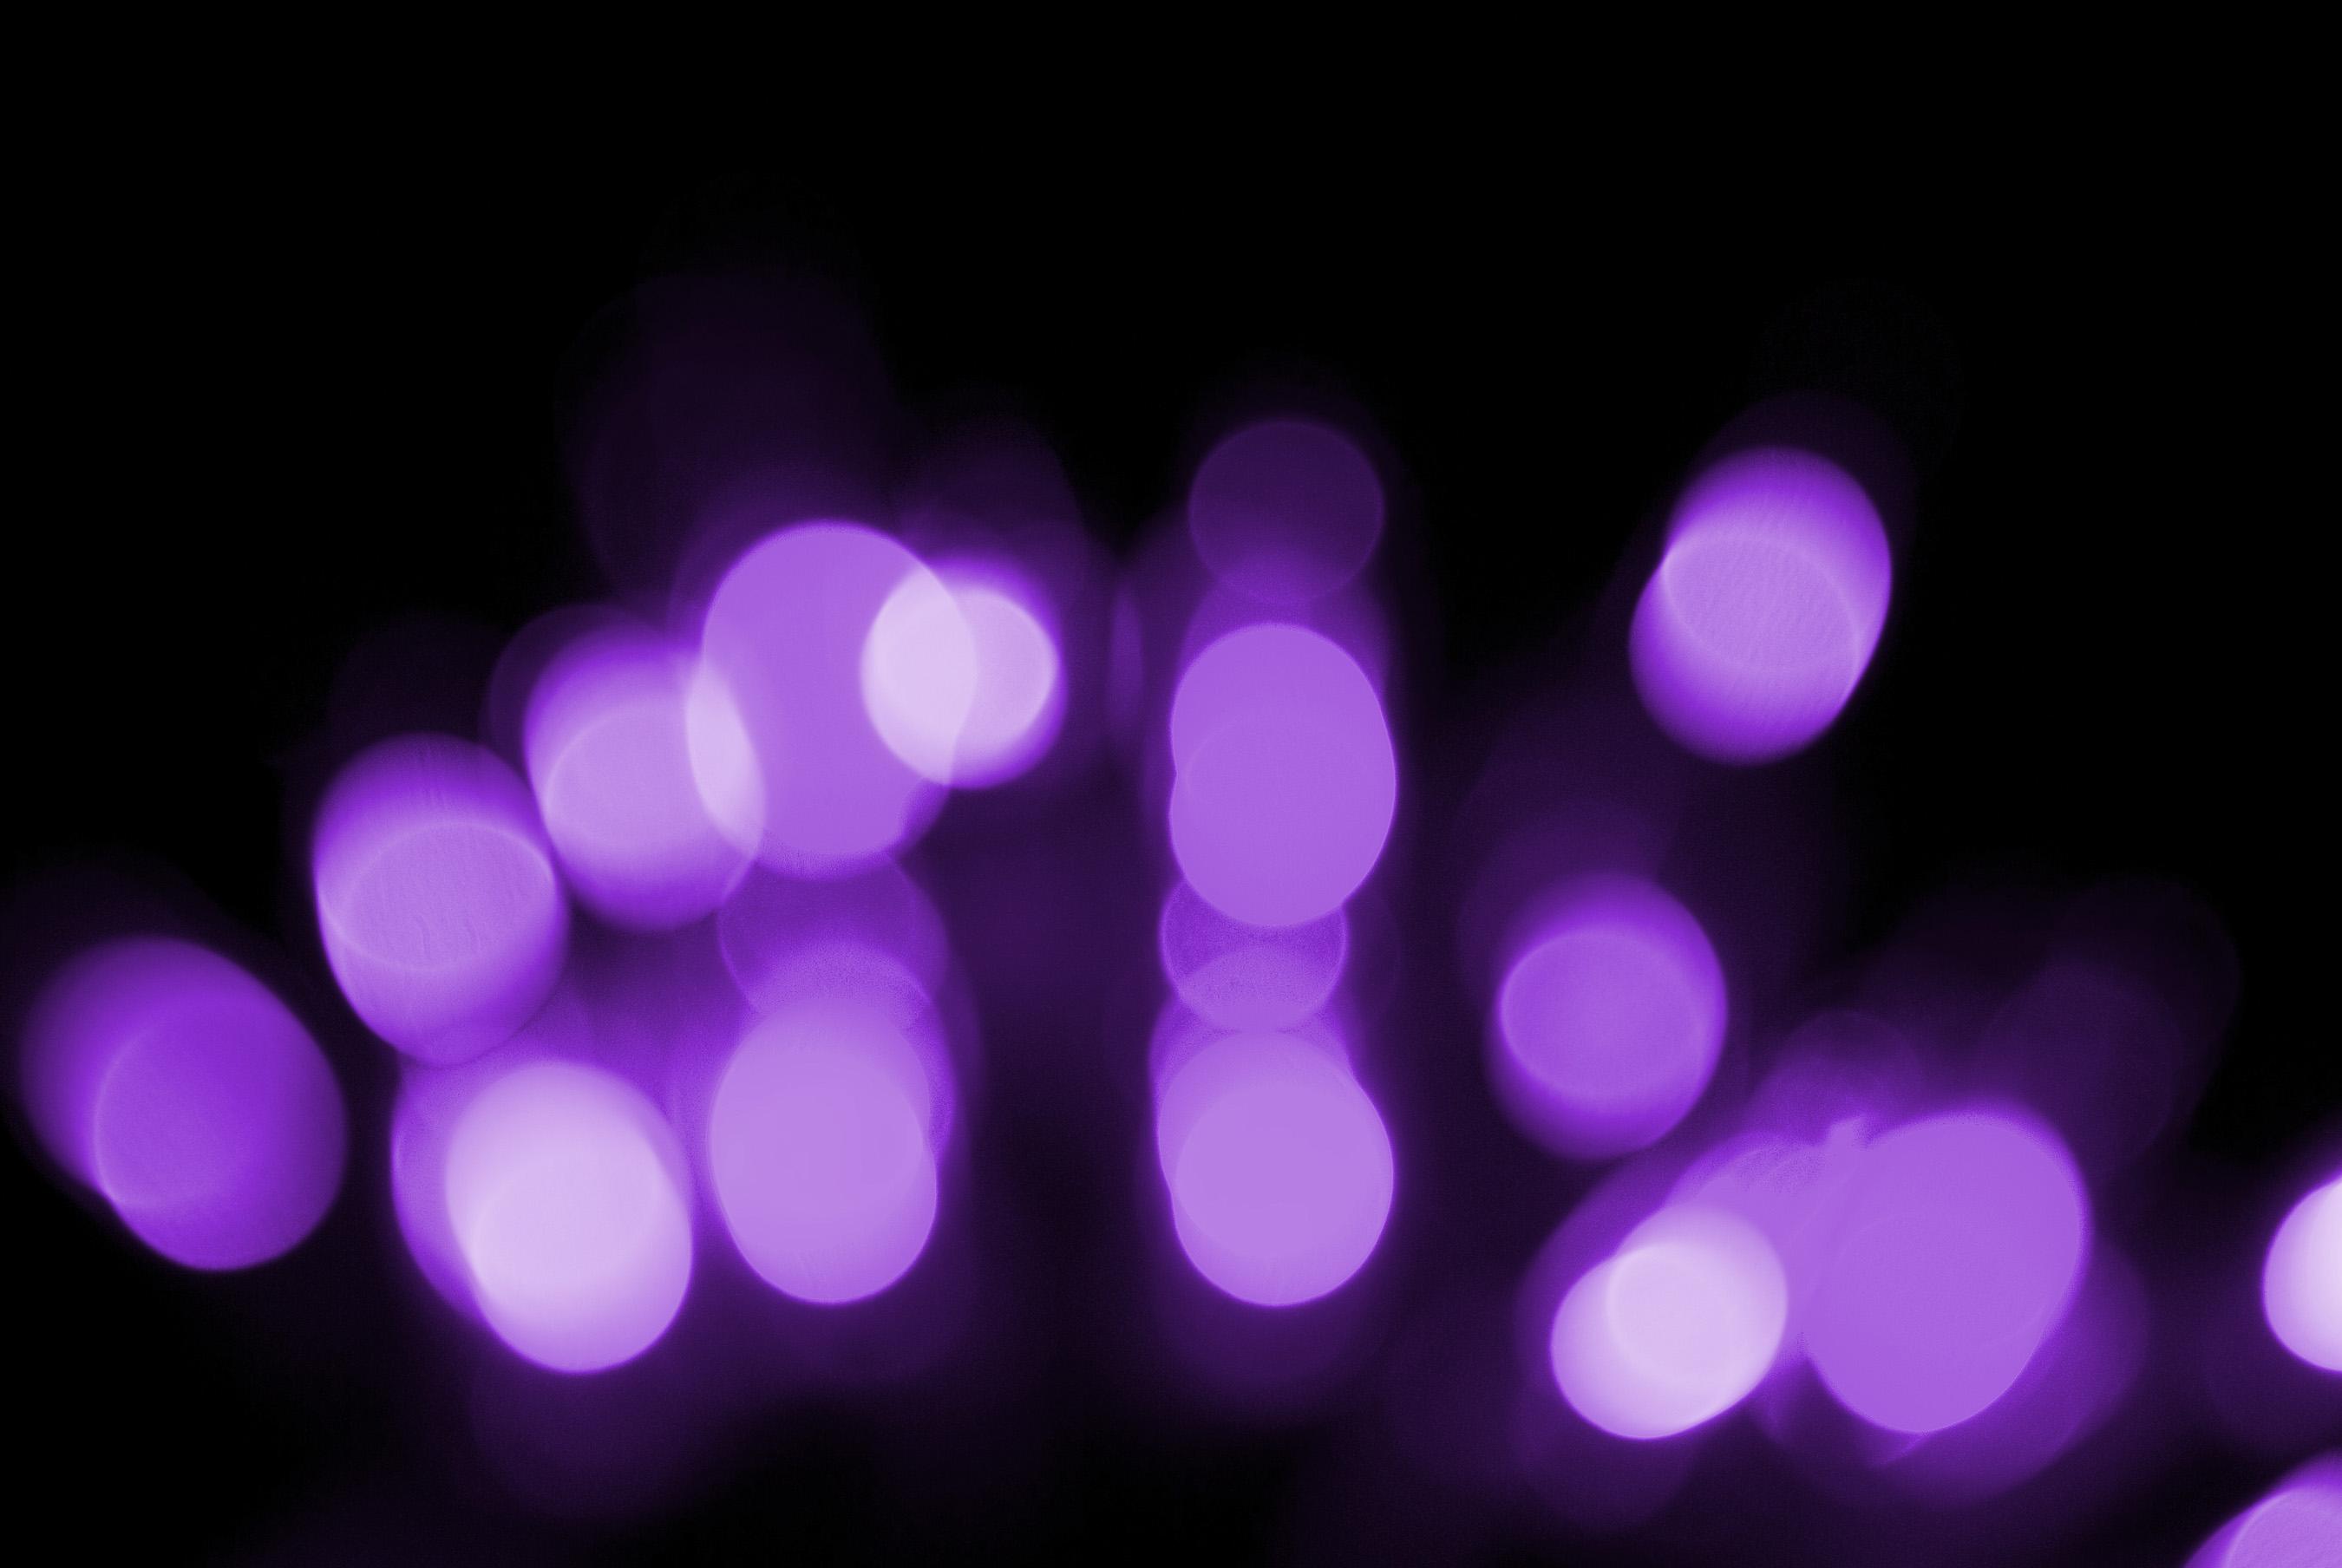 Free Stock Photo 1863 Purple Light Bokeh Freeimageslive